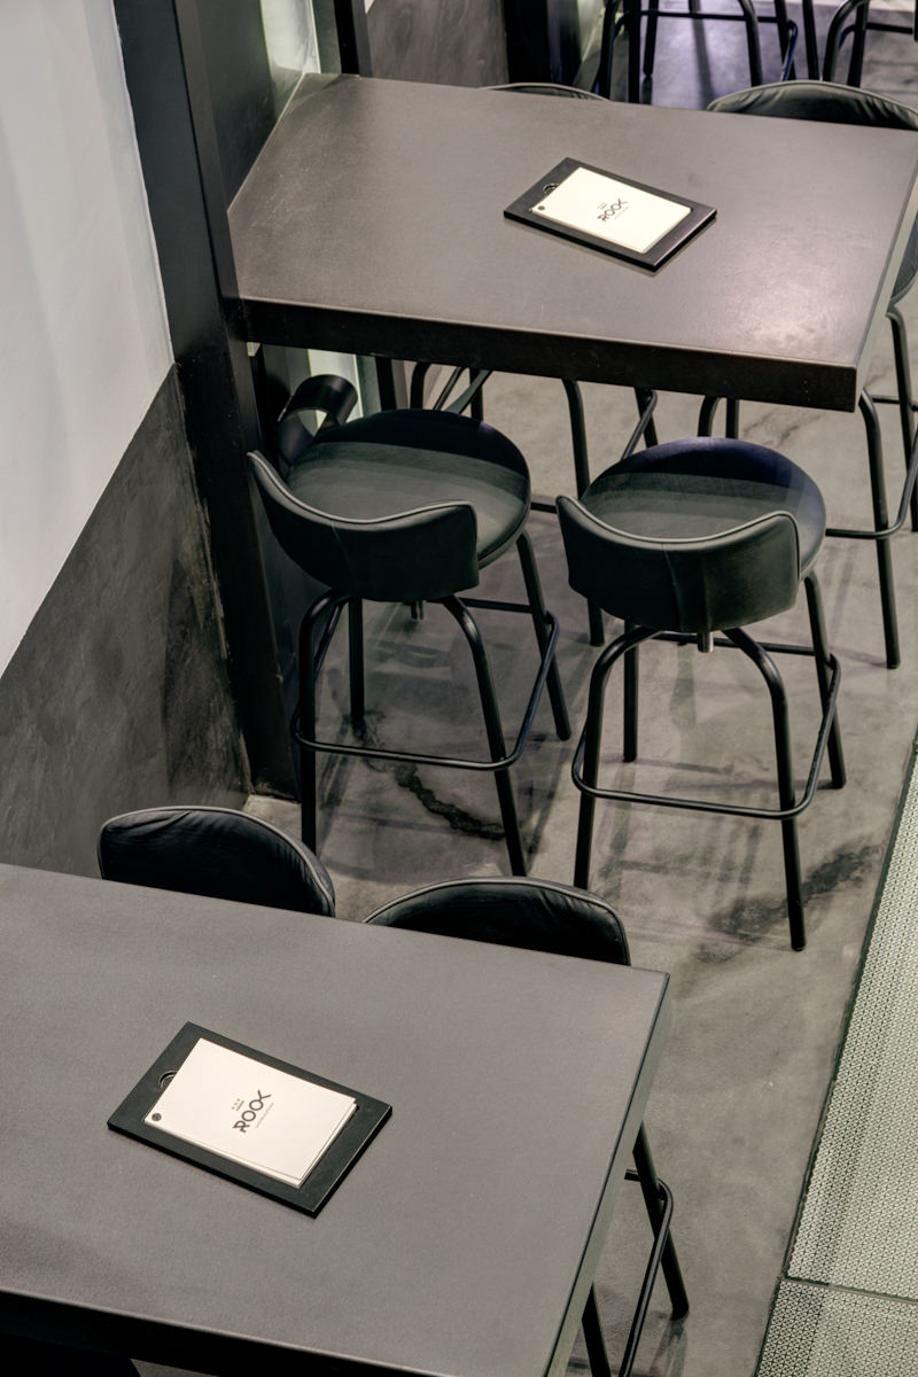 lavaplaster-rook-12